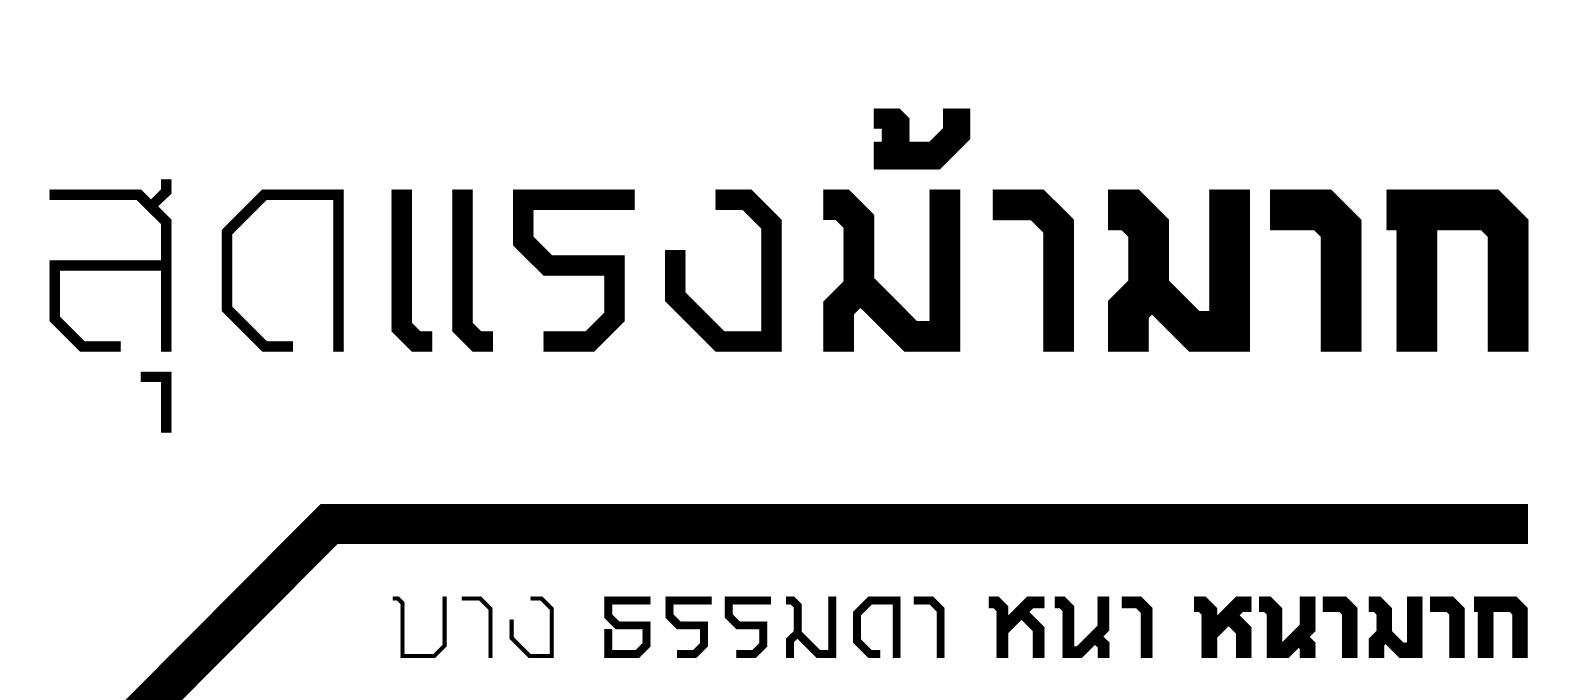 KATATRAD